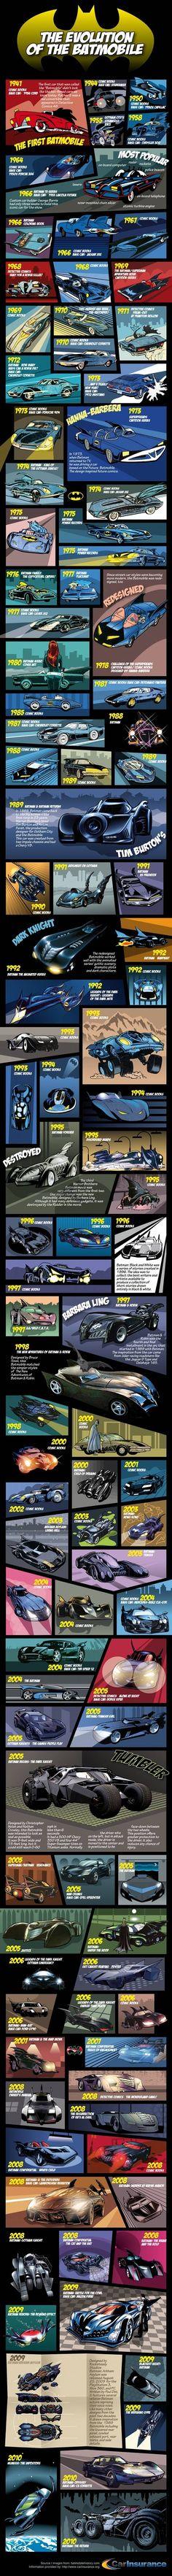 The Evolution of the Batmobile